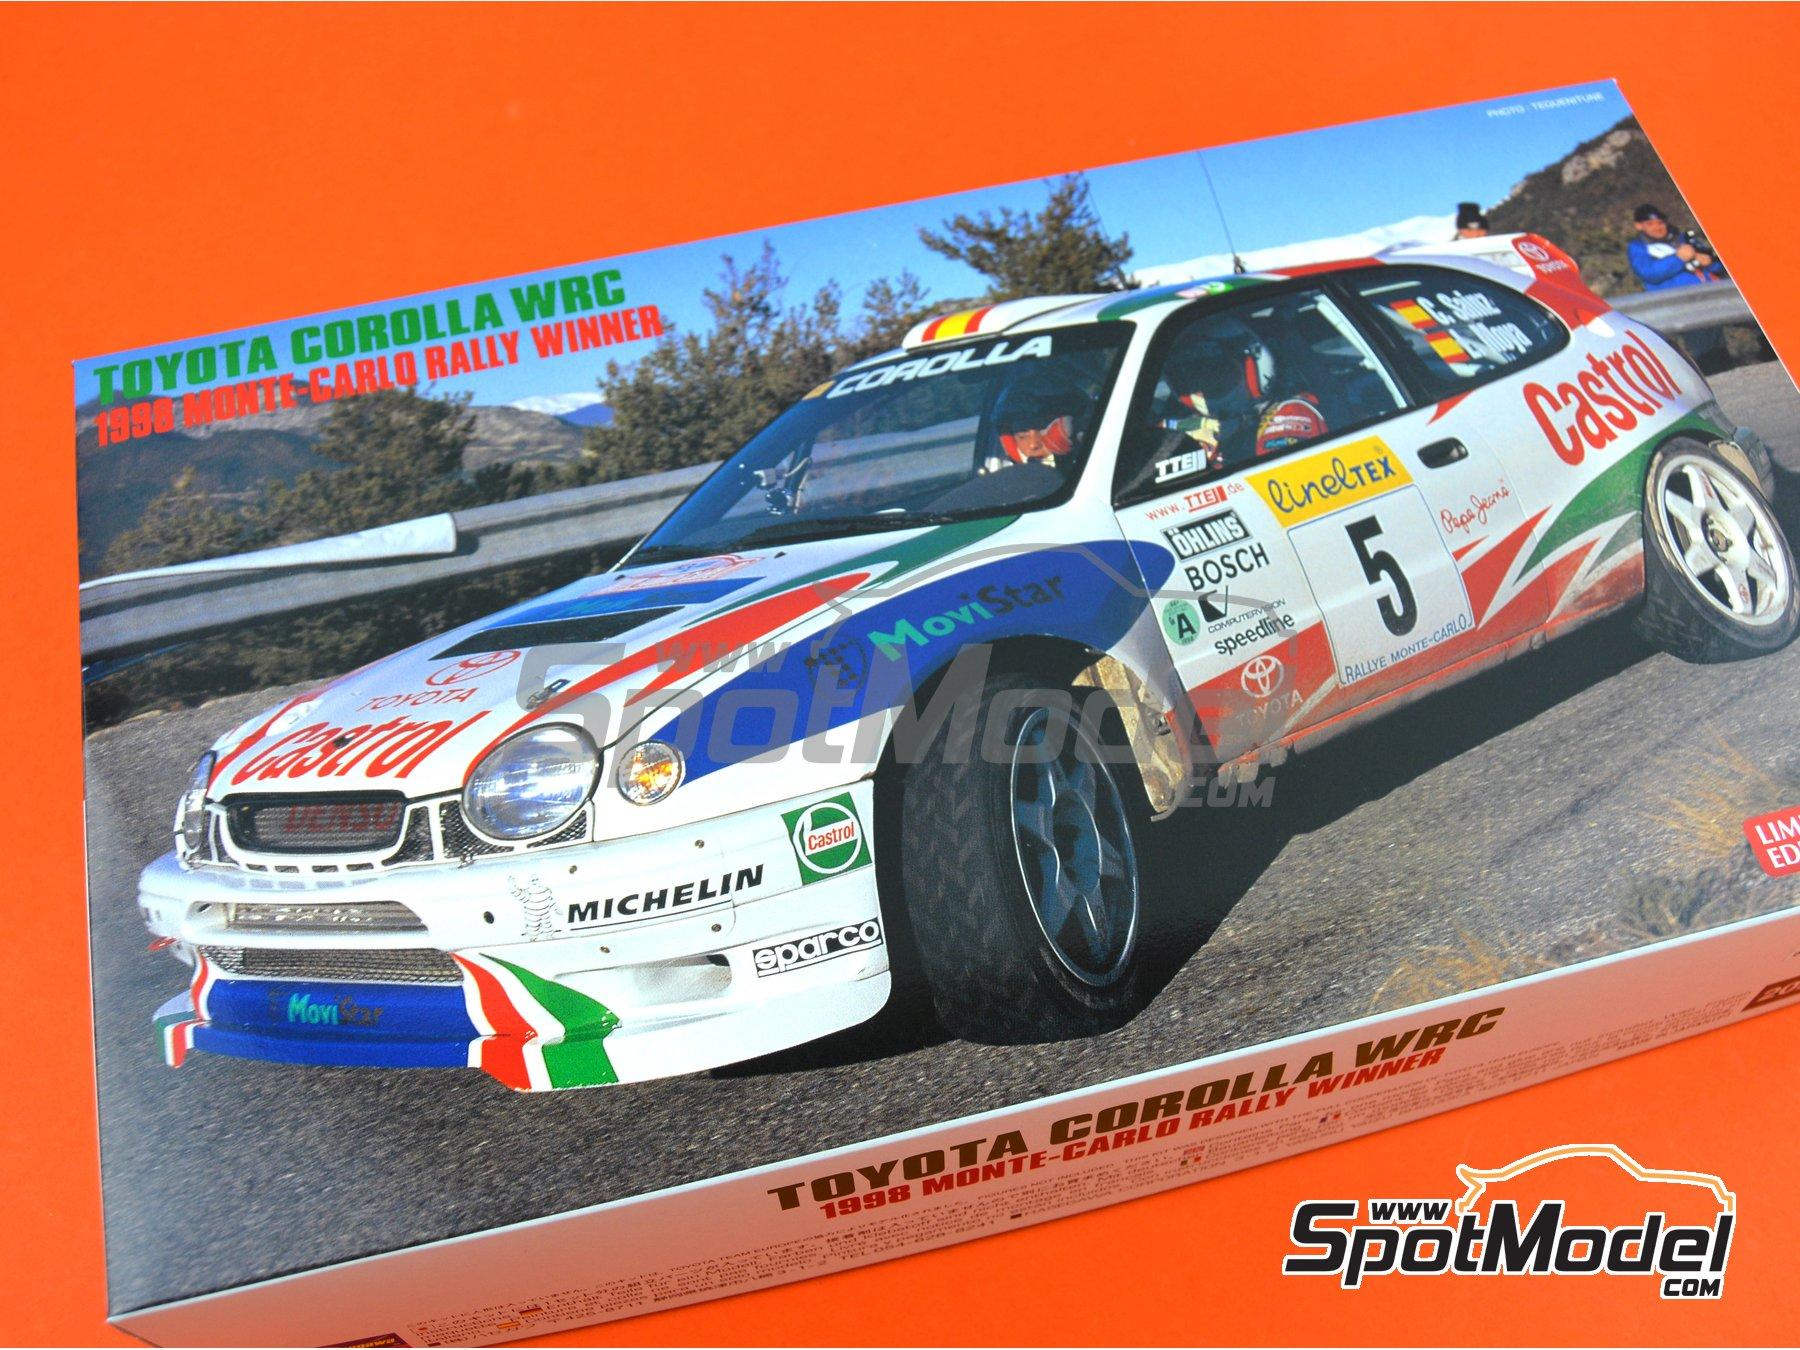 Image 18: Toyota Corolla WRC Castrol Movistar - Rally de Montecarlo 1998 | Maqueta de coche en escala1/24 fabricado por Hasegawa (ref.20266)